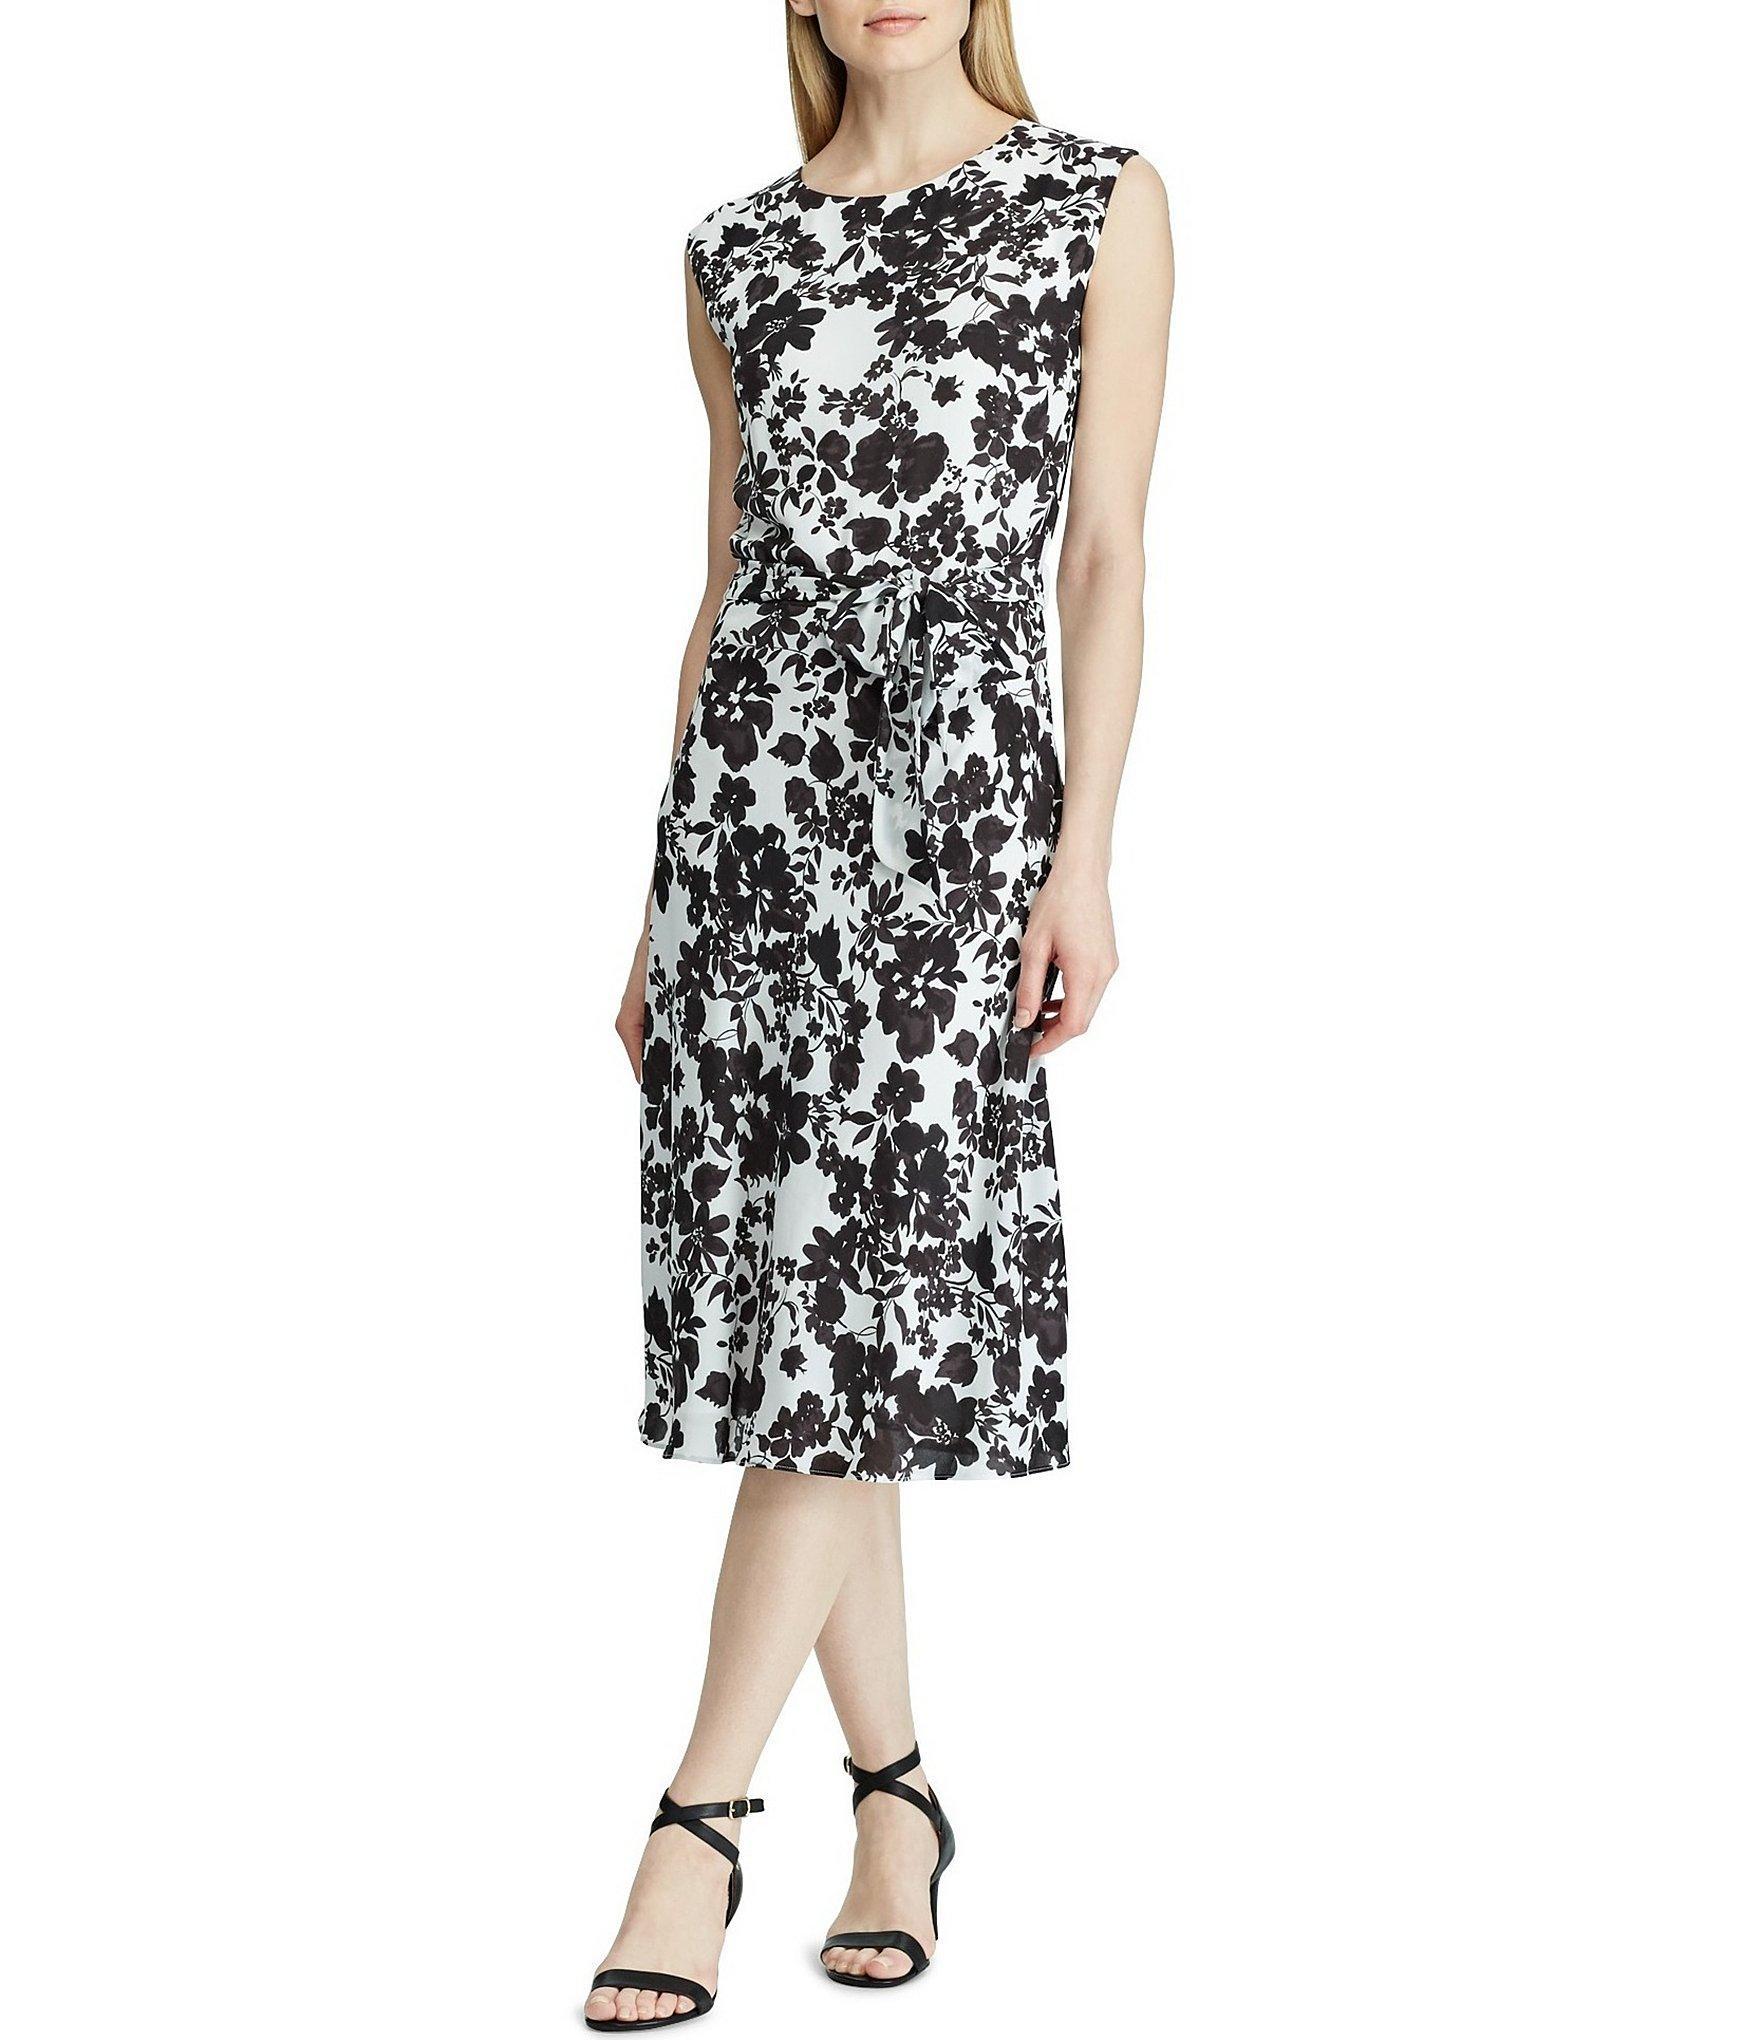 b2c4efb0d73 Lauren by Ralph Lauren. Women s Black Monotone Floral Print Sleeveless  Georgette Midi Dress